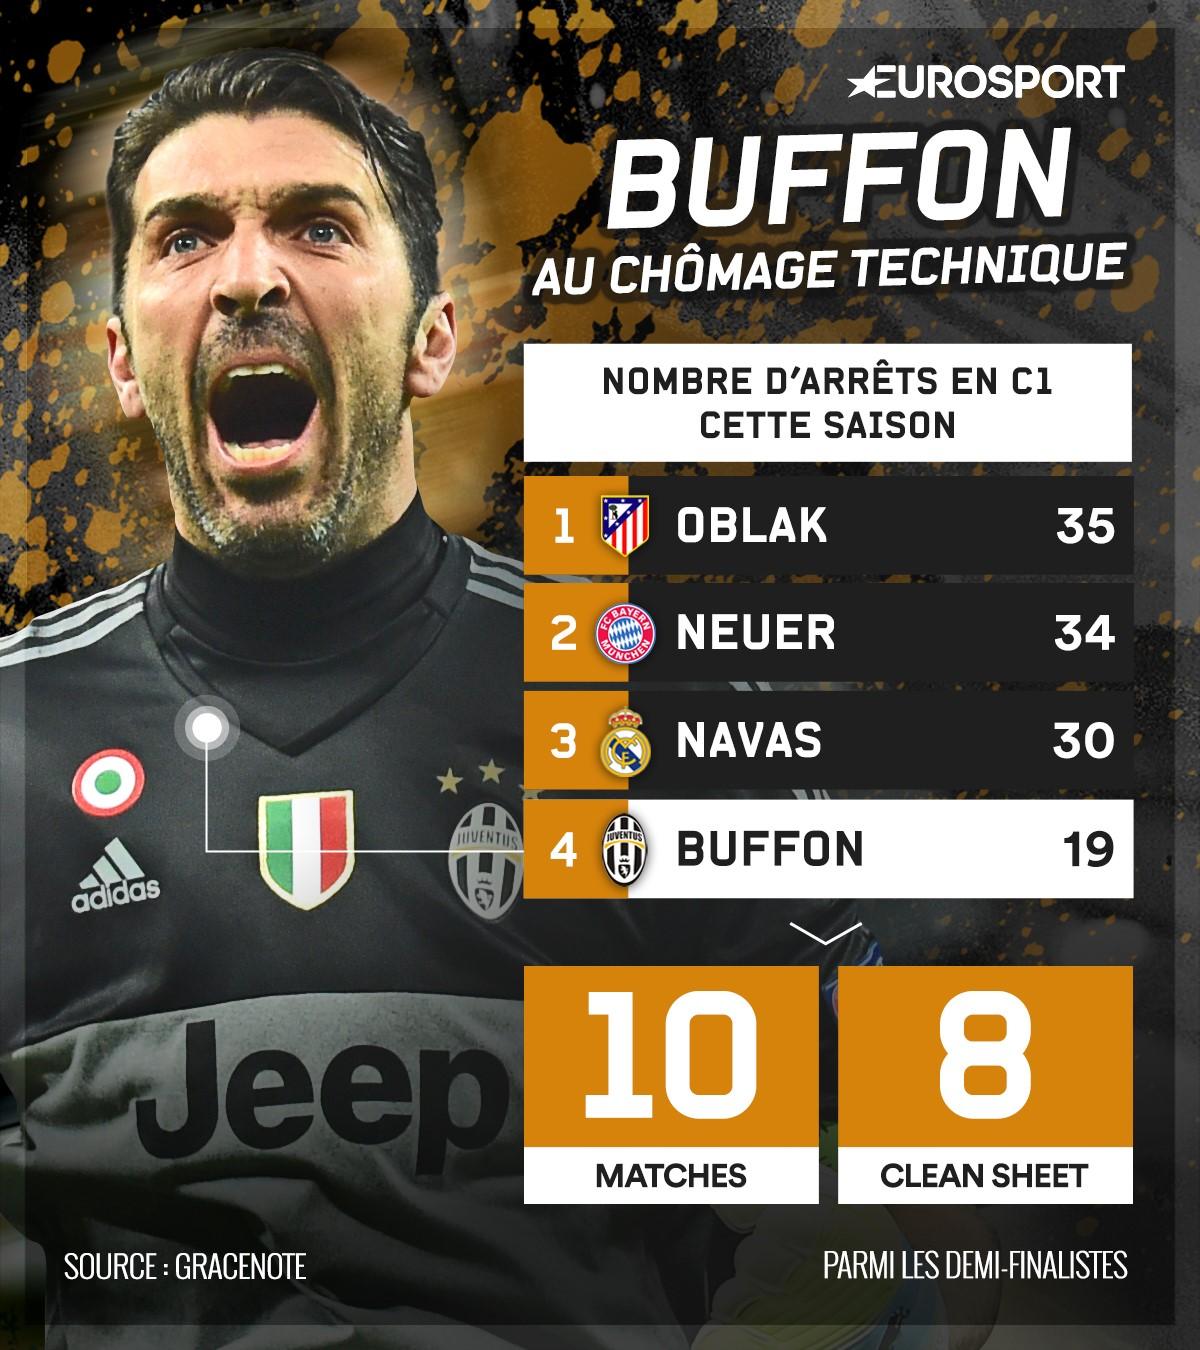 C1 - La Juventus Turin en finale, Monaco éliminé